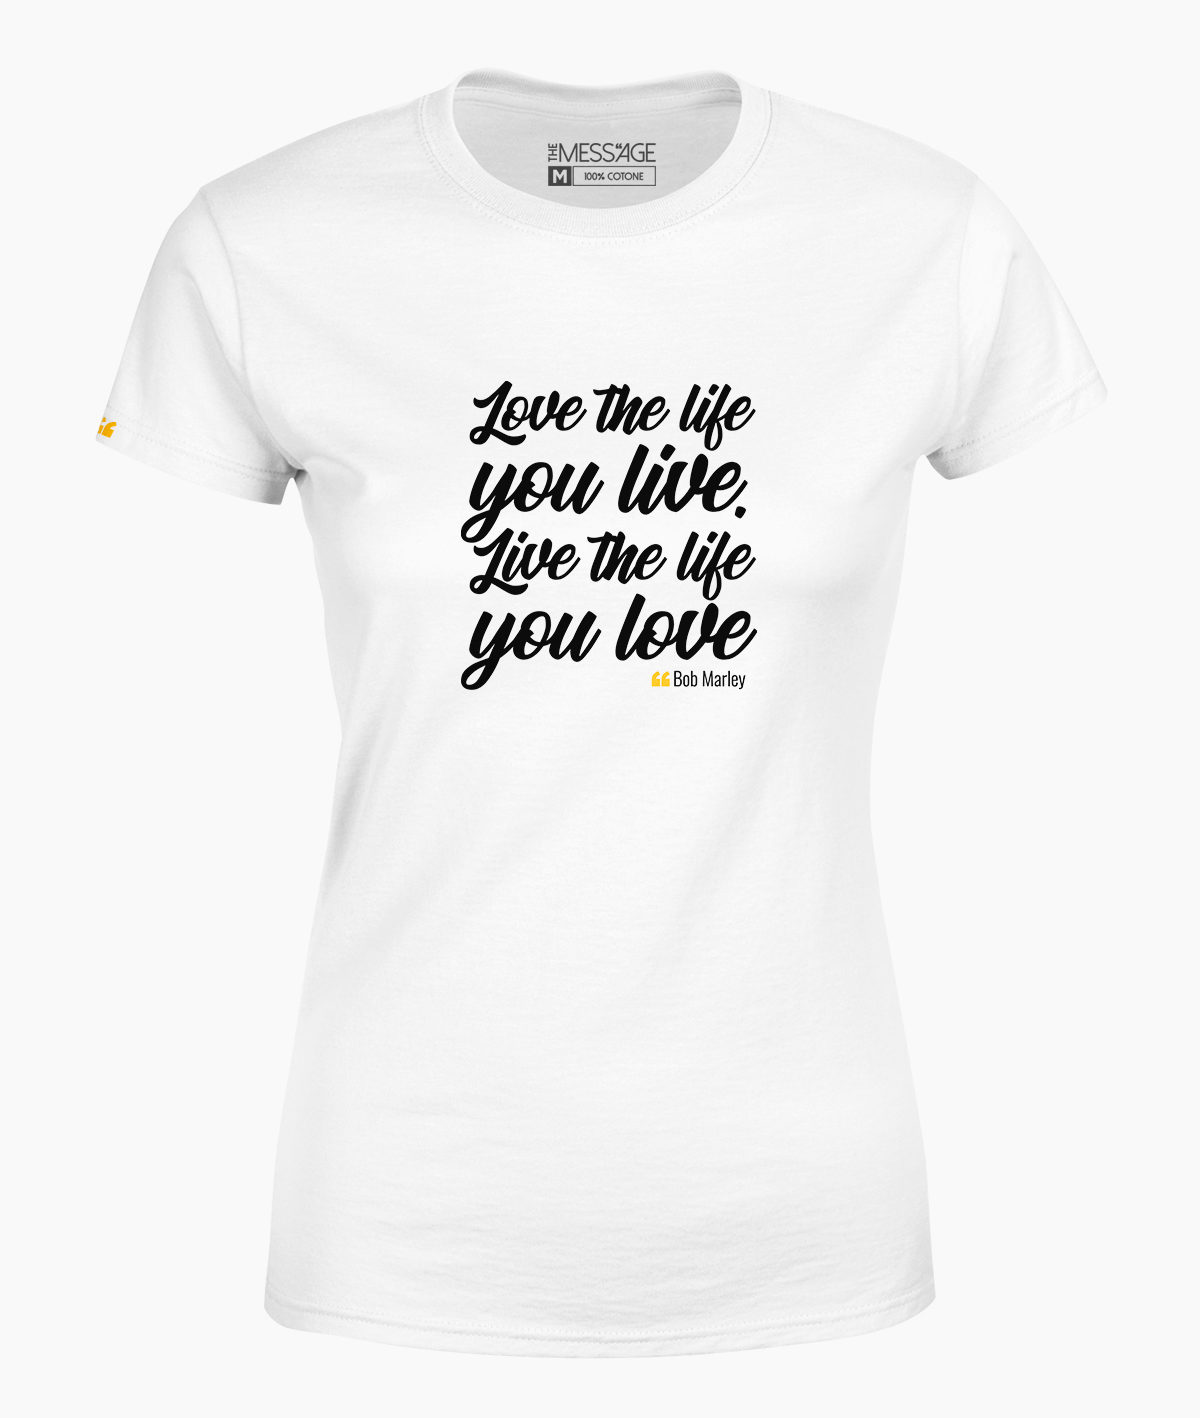 T-Shirt – Love the life you live – Bob Marley